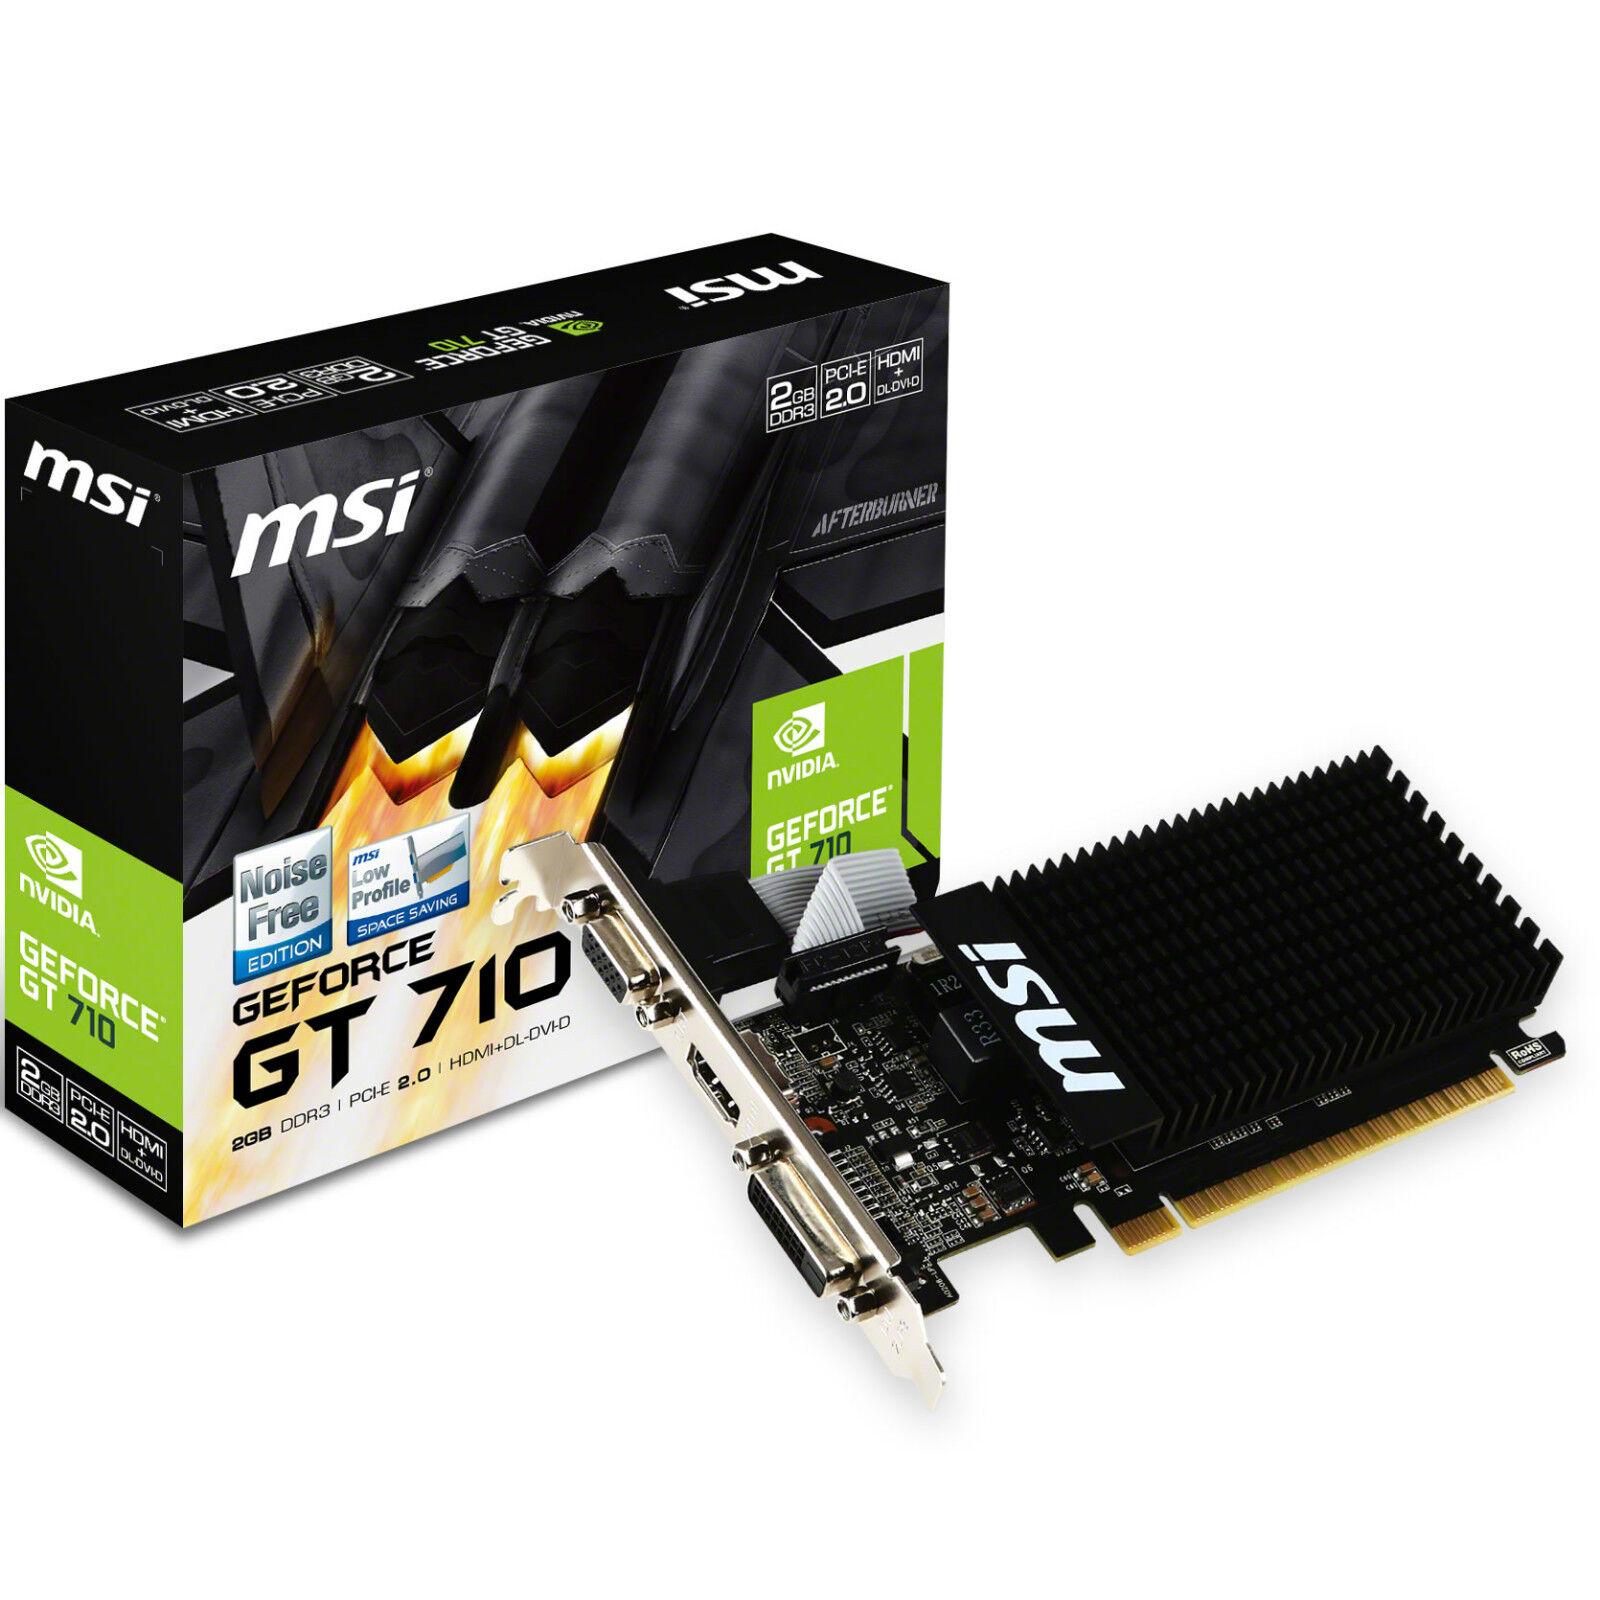 SCHEDA VIDEO MSI NVIDIA GEFORCE GT710 2GB DDR3 PCI-E DVI HDMI LOW PROFILE